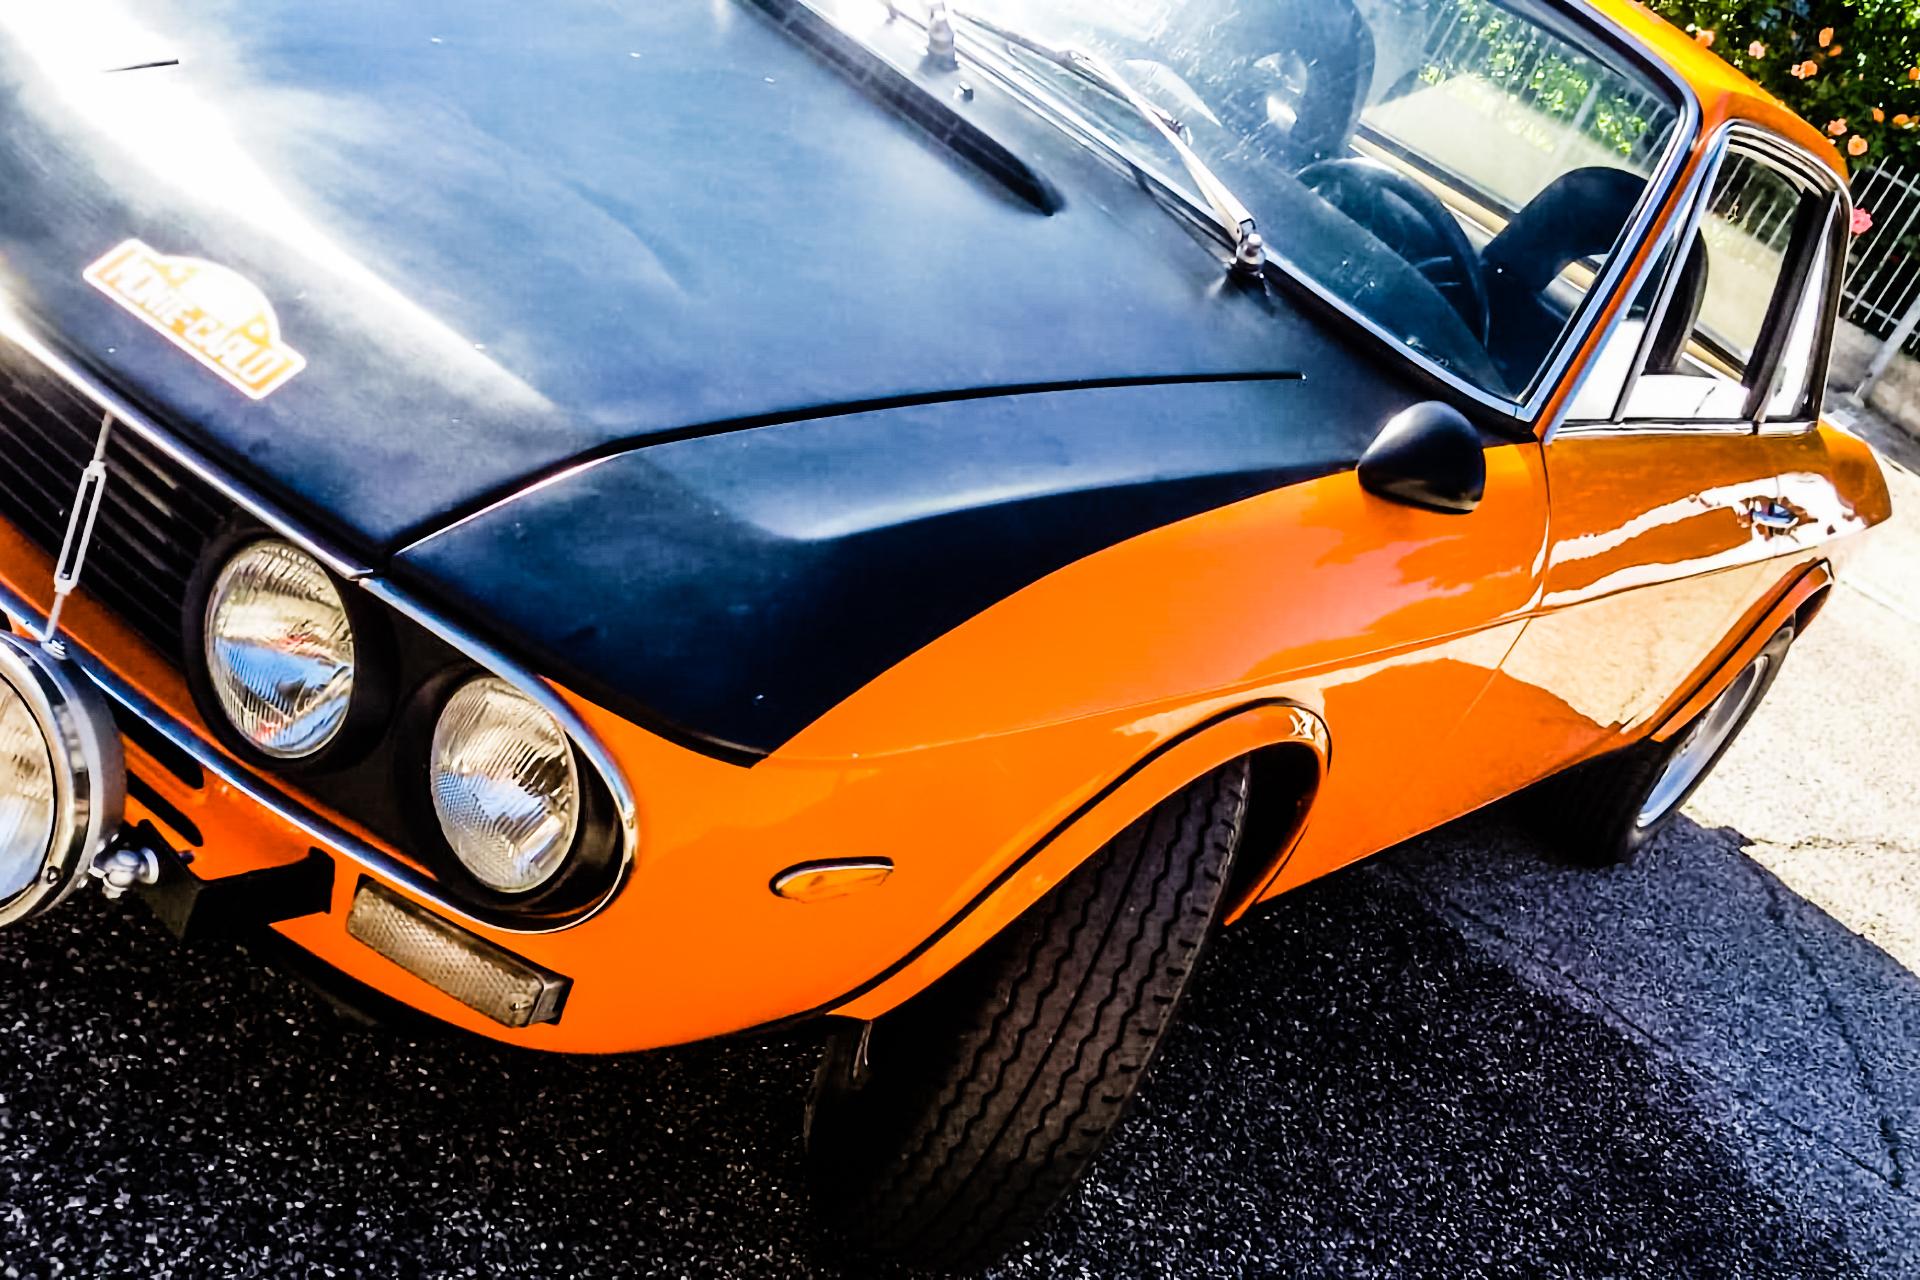 1972, LANCIA FULVIA Coupè 1.3s second serie Montecarlo